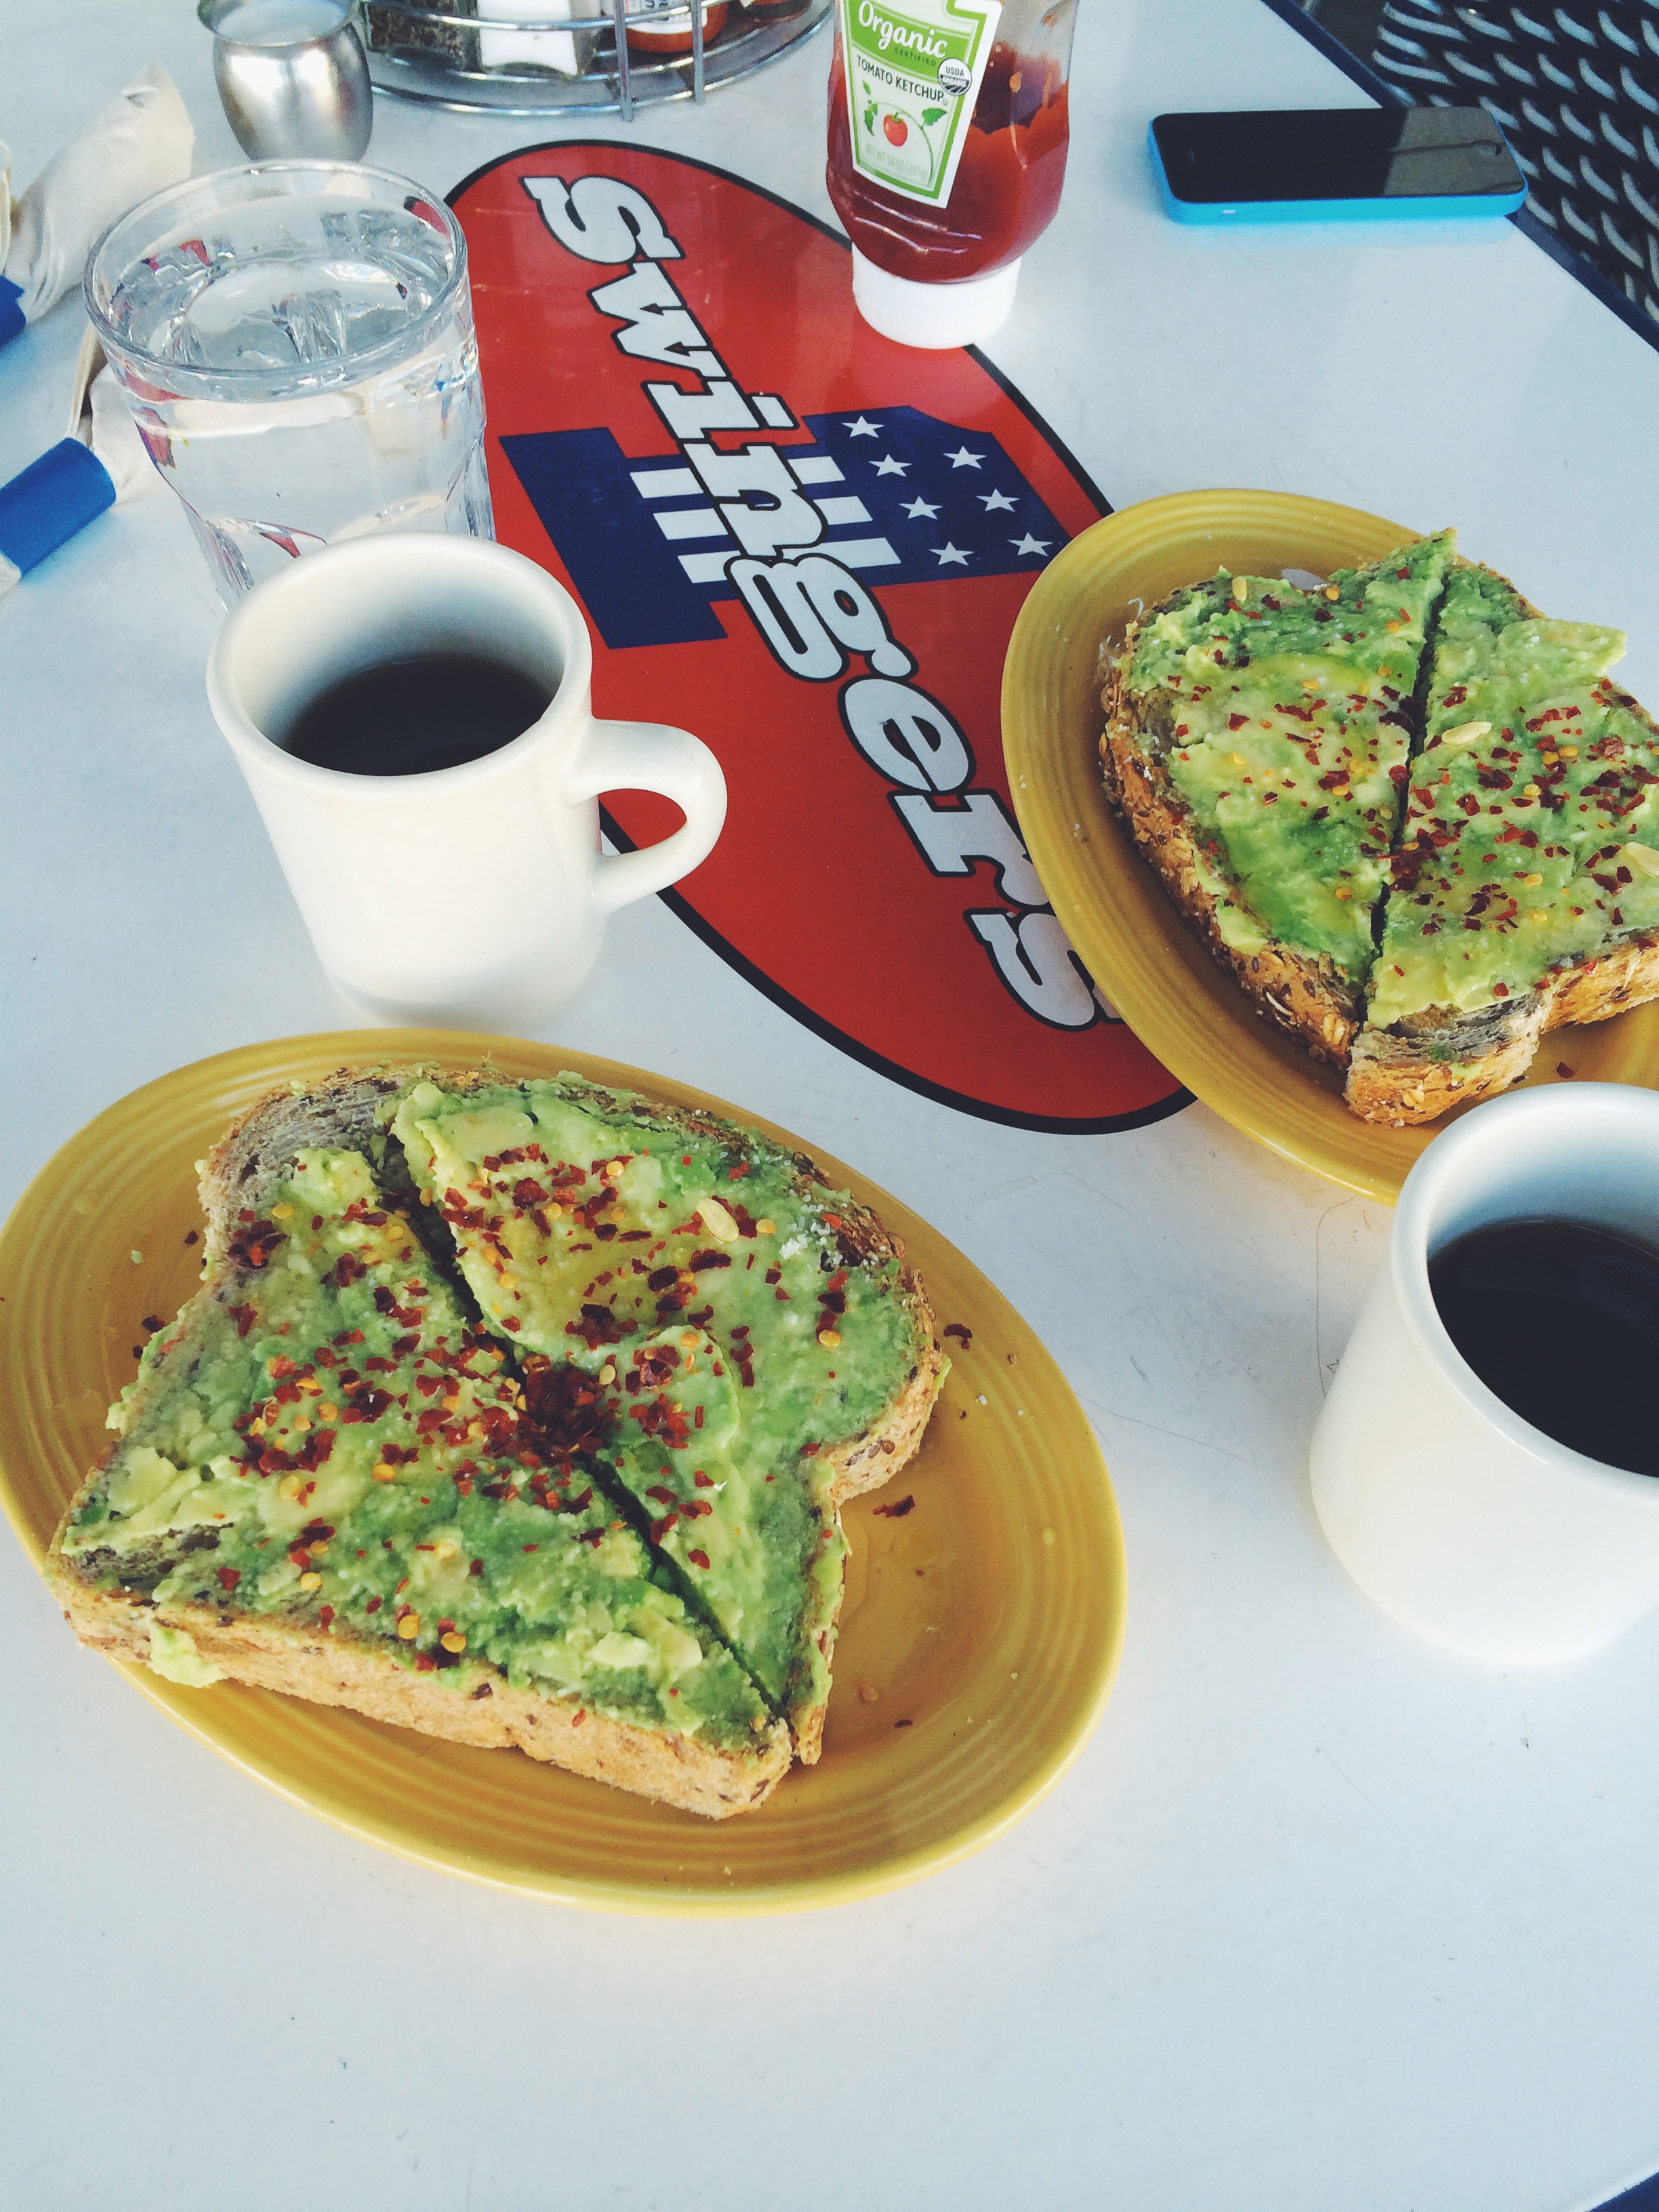 Swingers Cafe / Los Angeles, CA